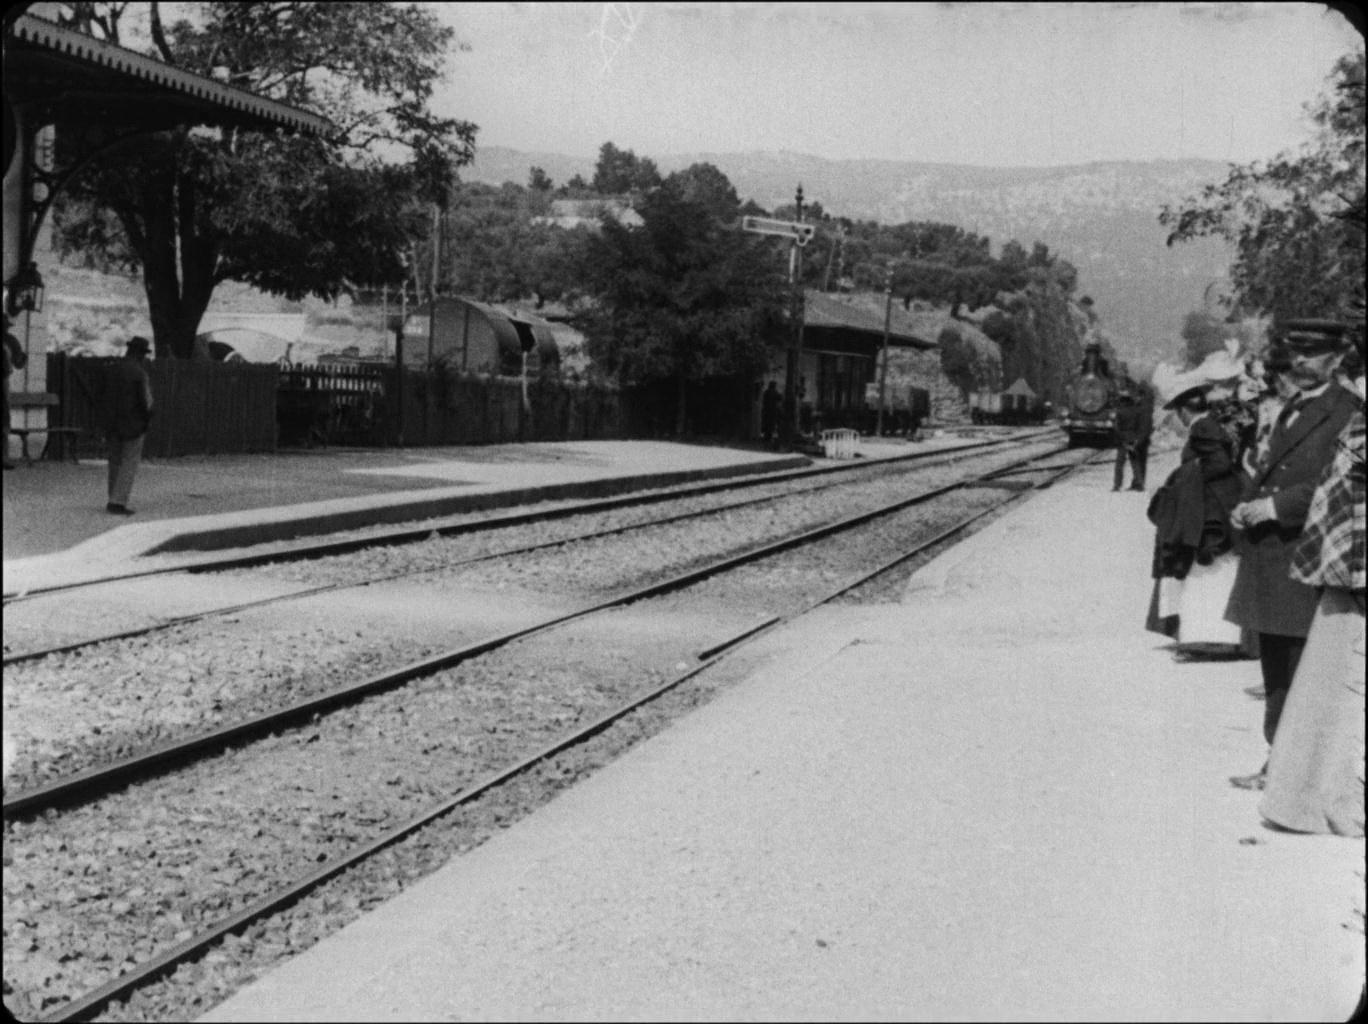 Galerie L'arrivée d'un train en gare de La Ciotat 1